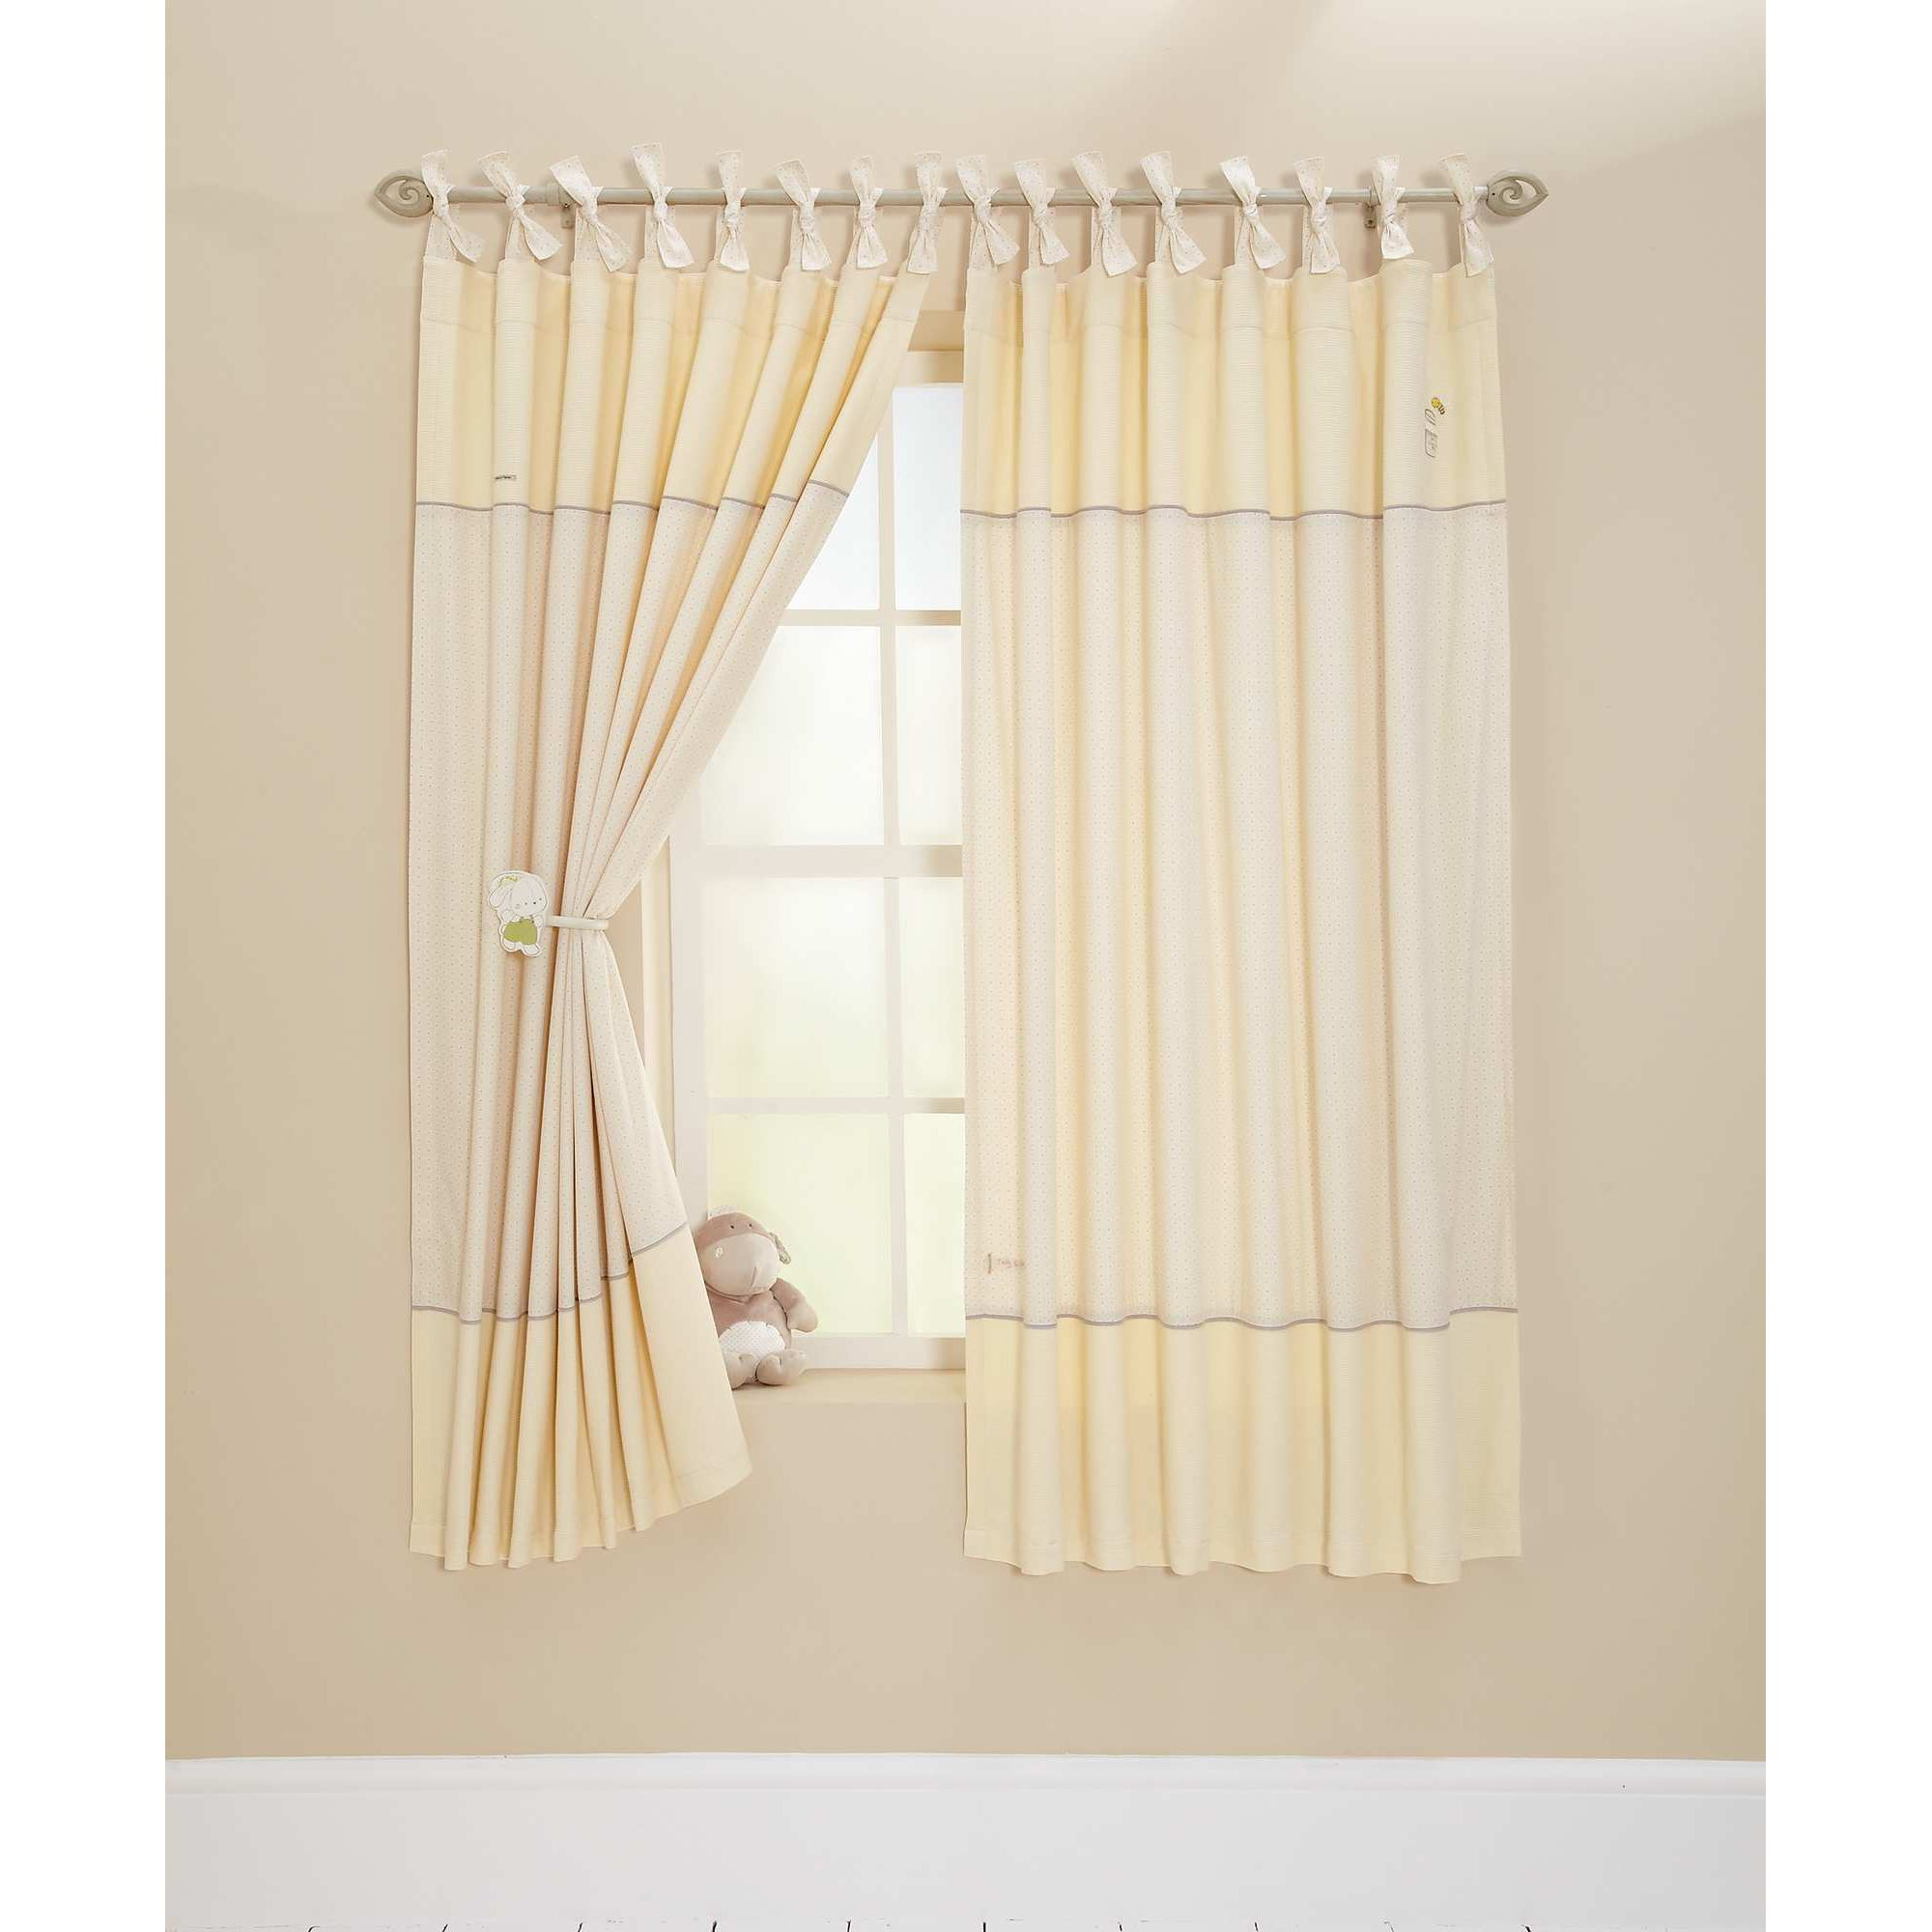 Winnie the pooh curtains for nursery home the honoroak for Nursery curtains uk